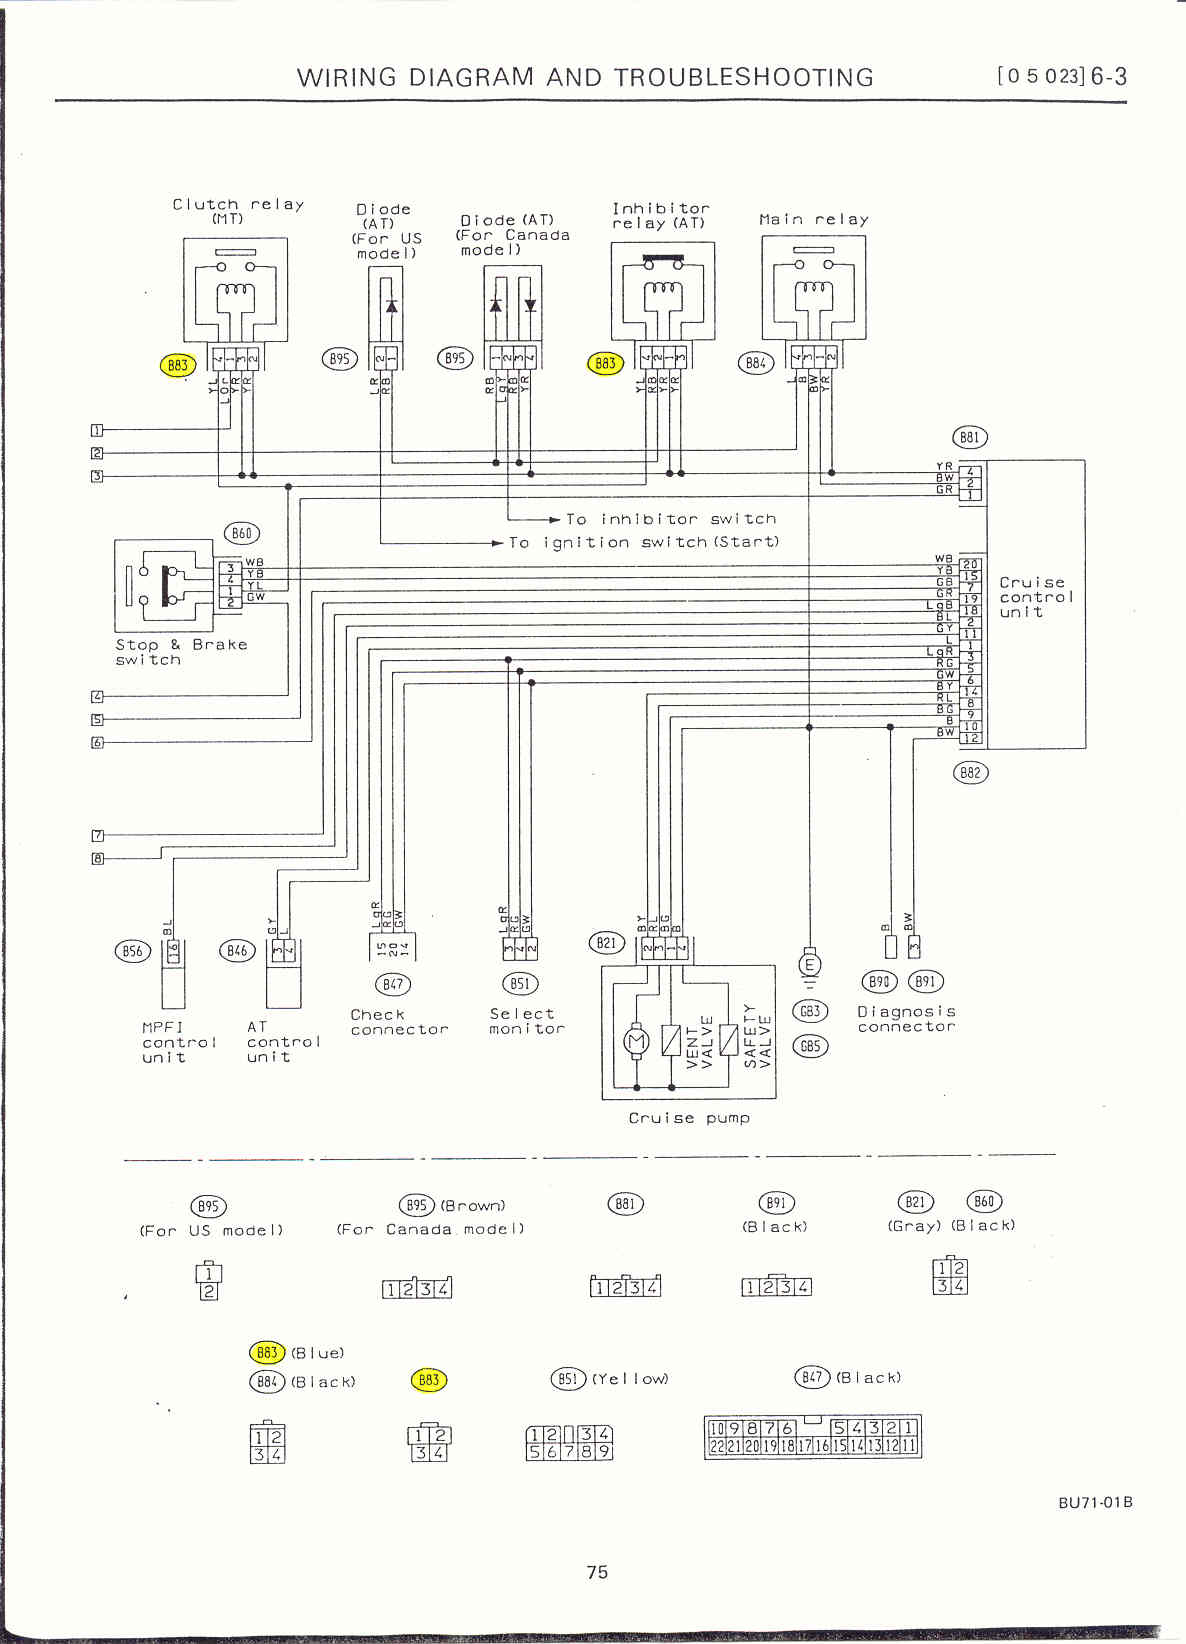 2000 subaru legacy wiring diagram pdf